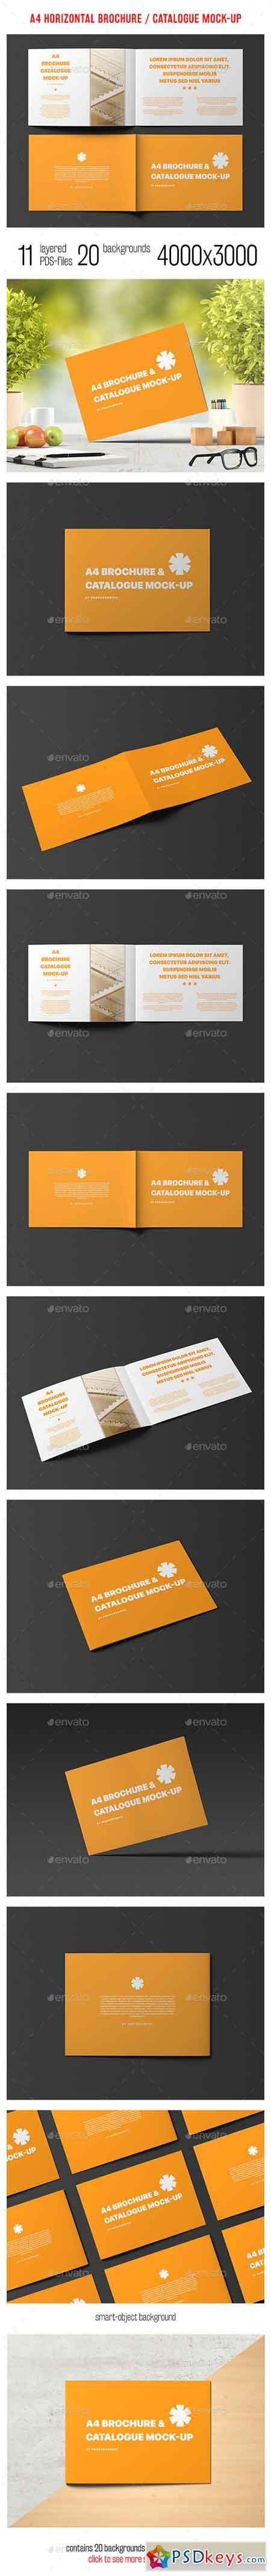 A4 Horizontal Brochure Catalogue Mock-Up 14417364